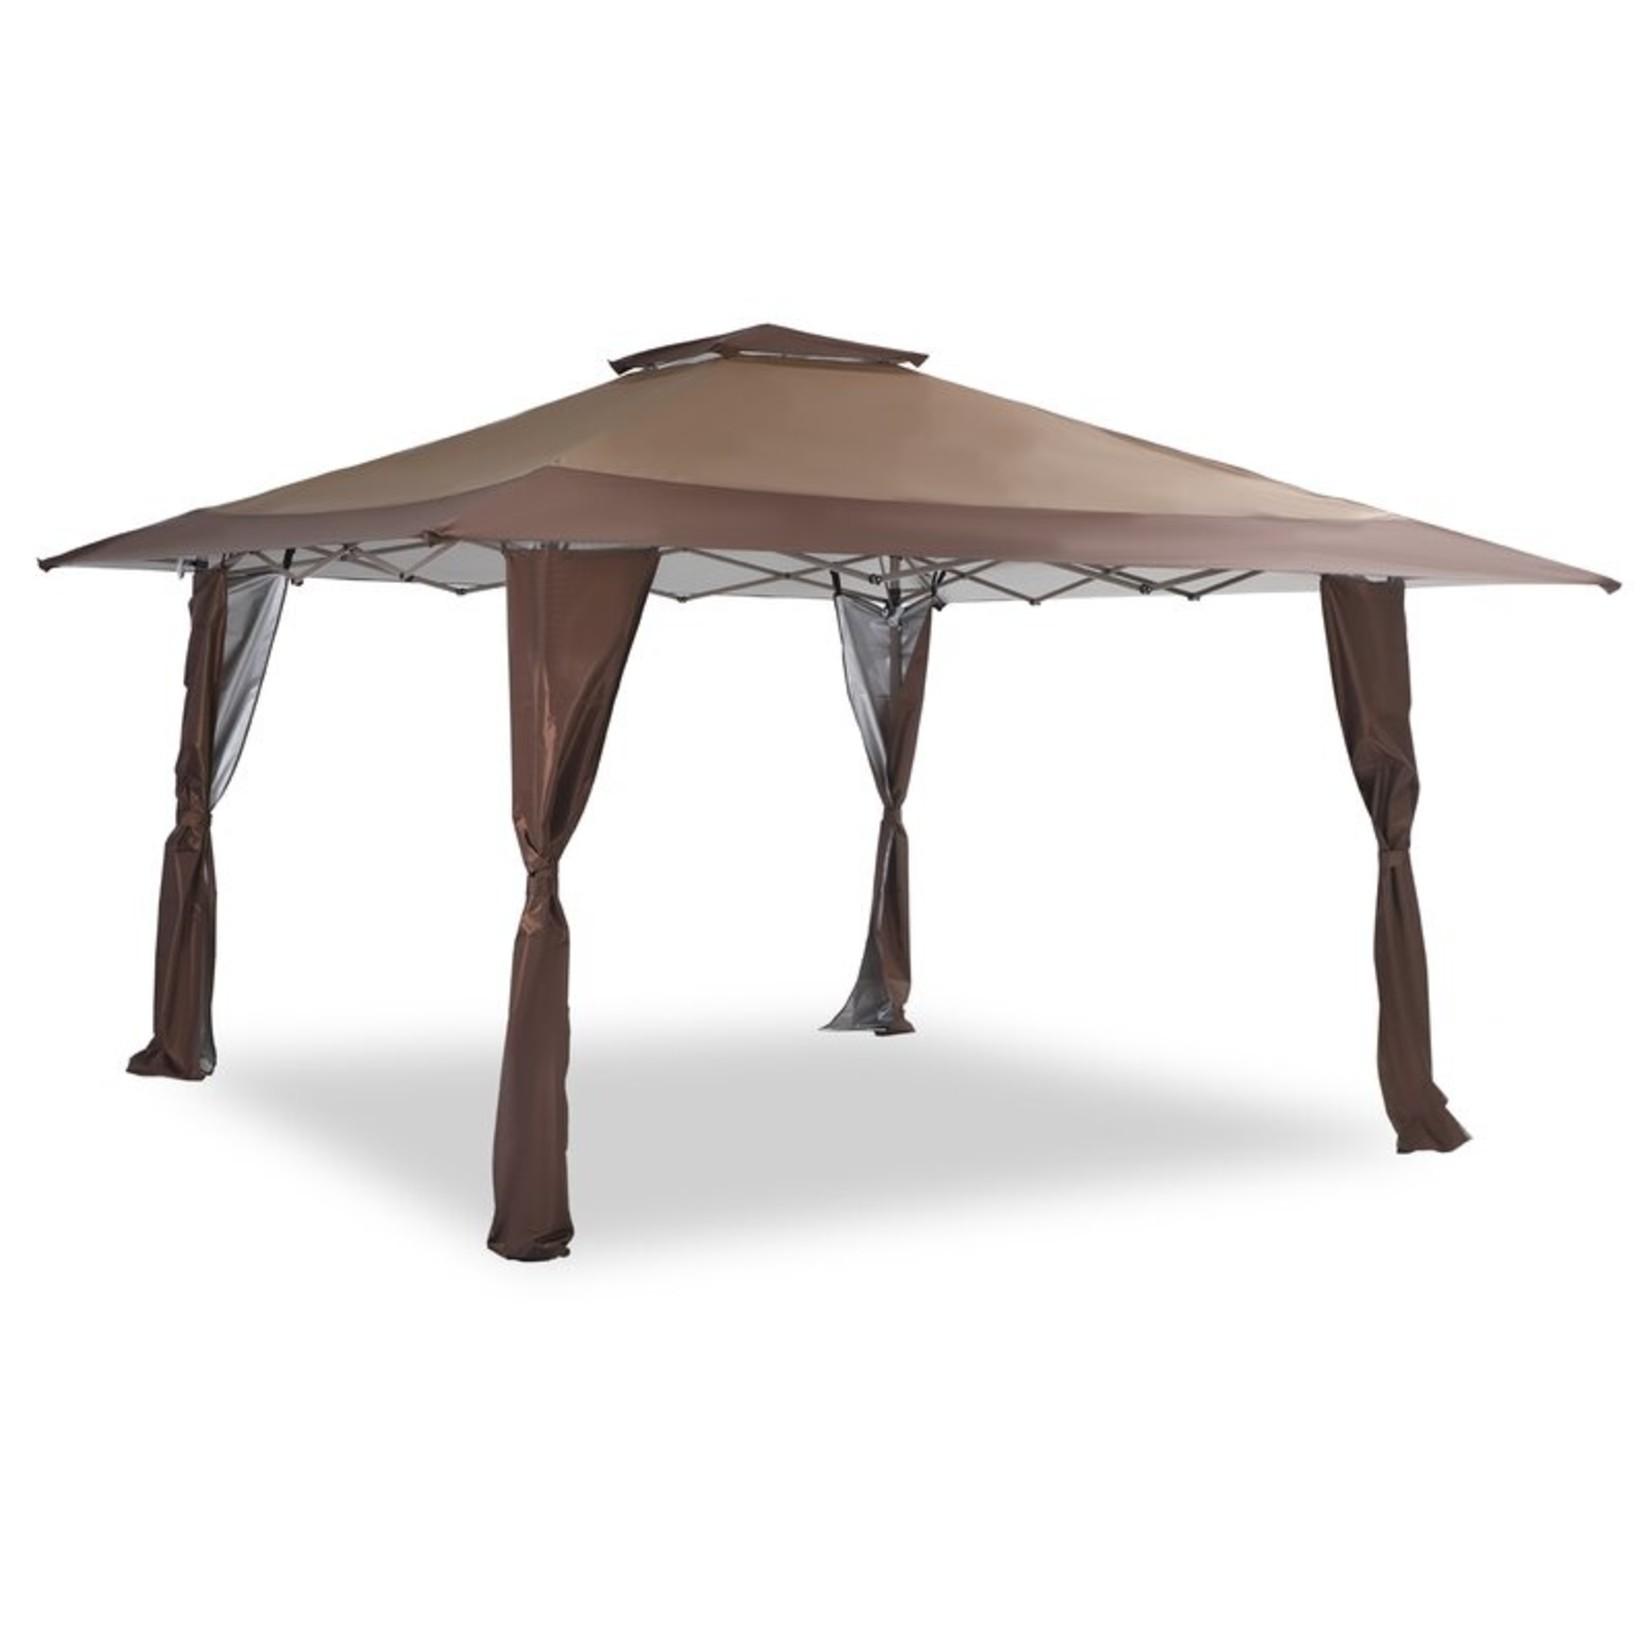 *13 Ft. W x 13 Ft. D Steel Pop-up Canopy